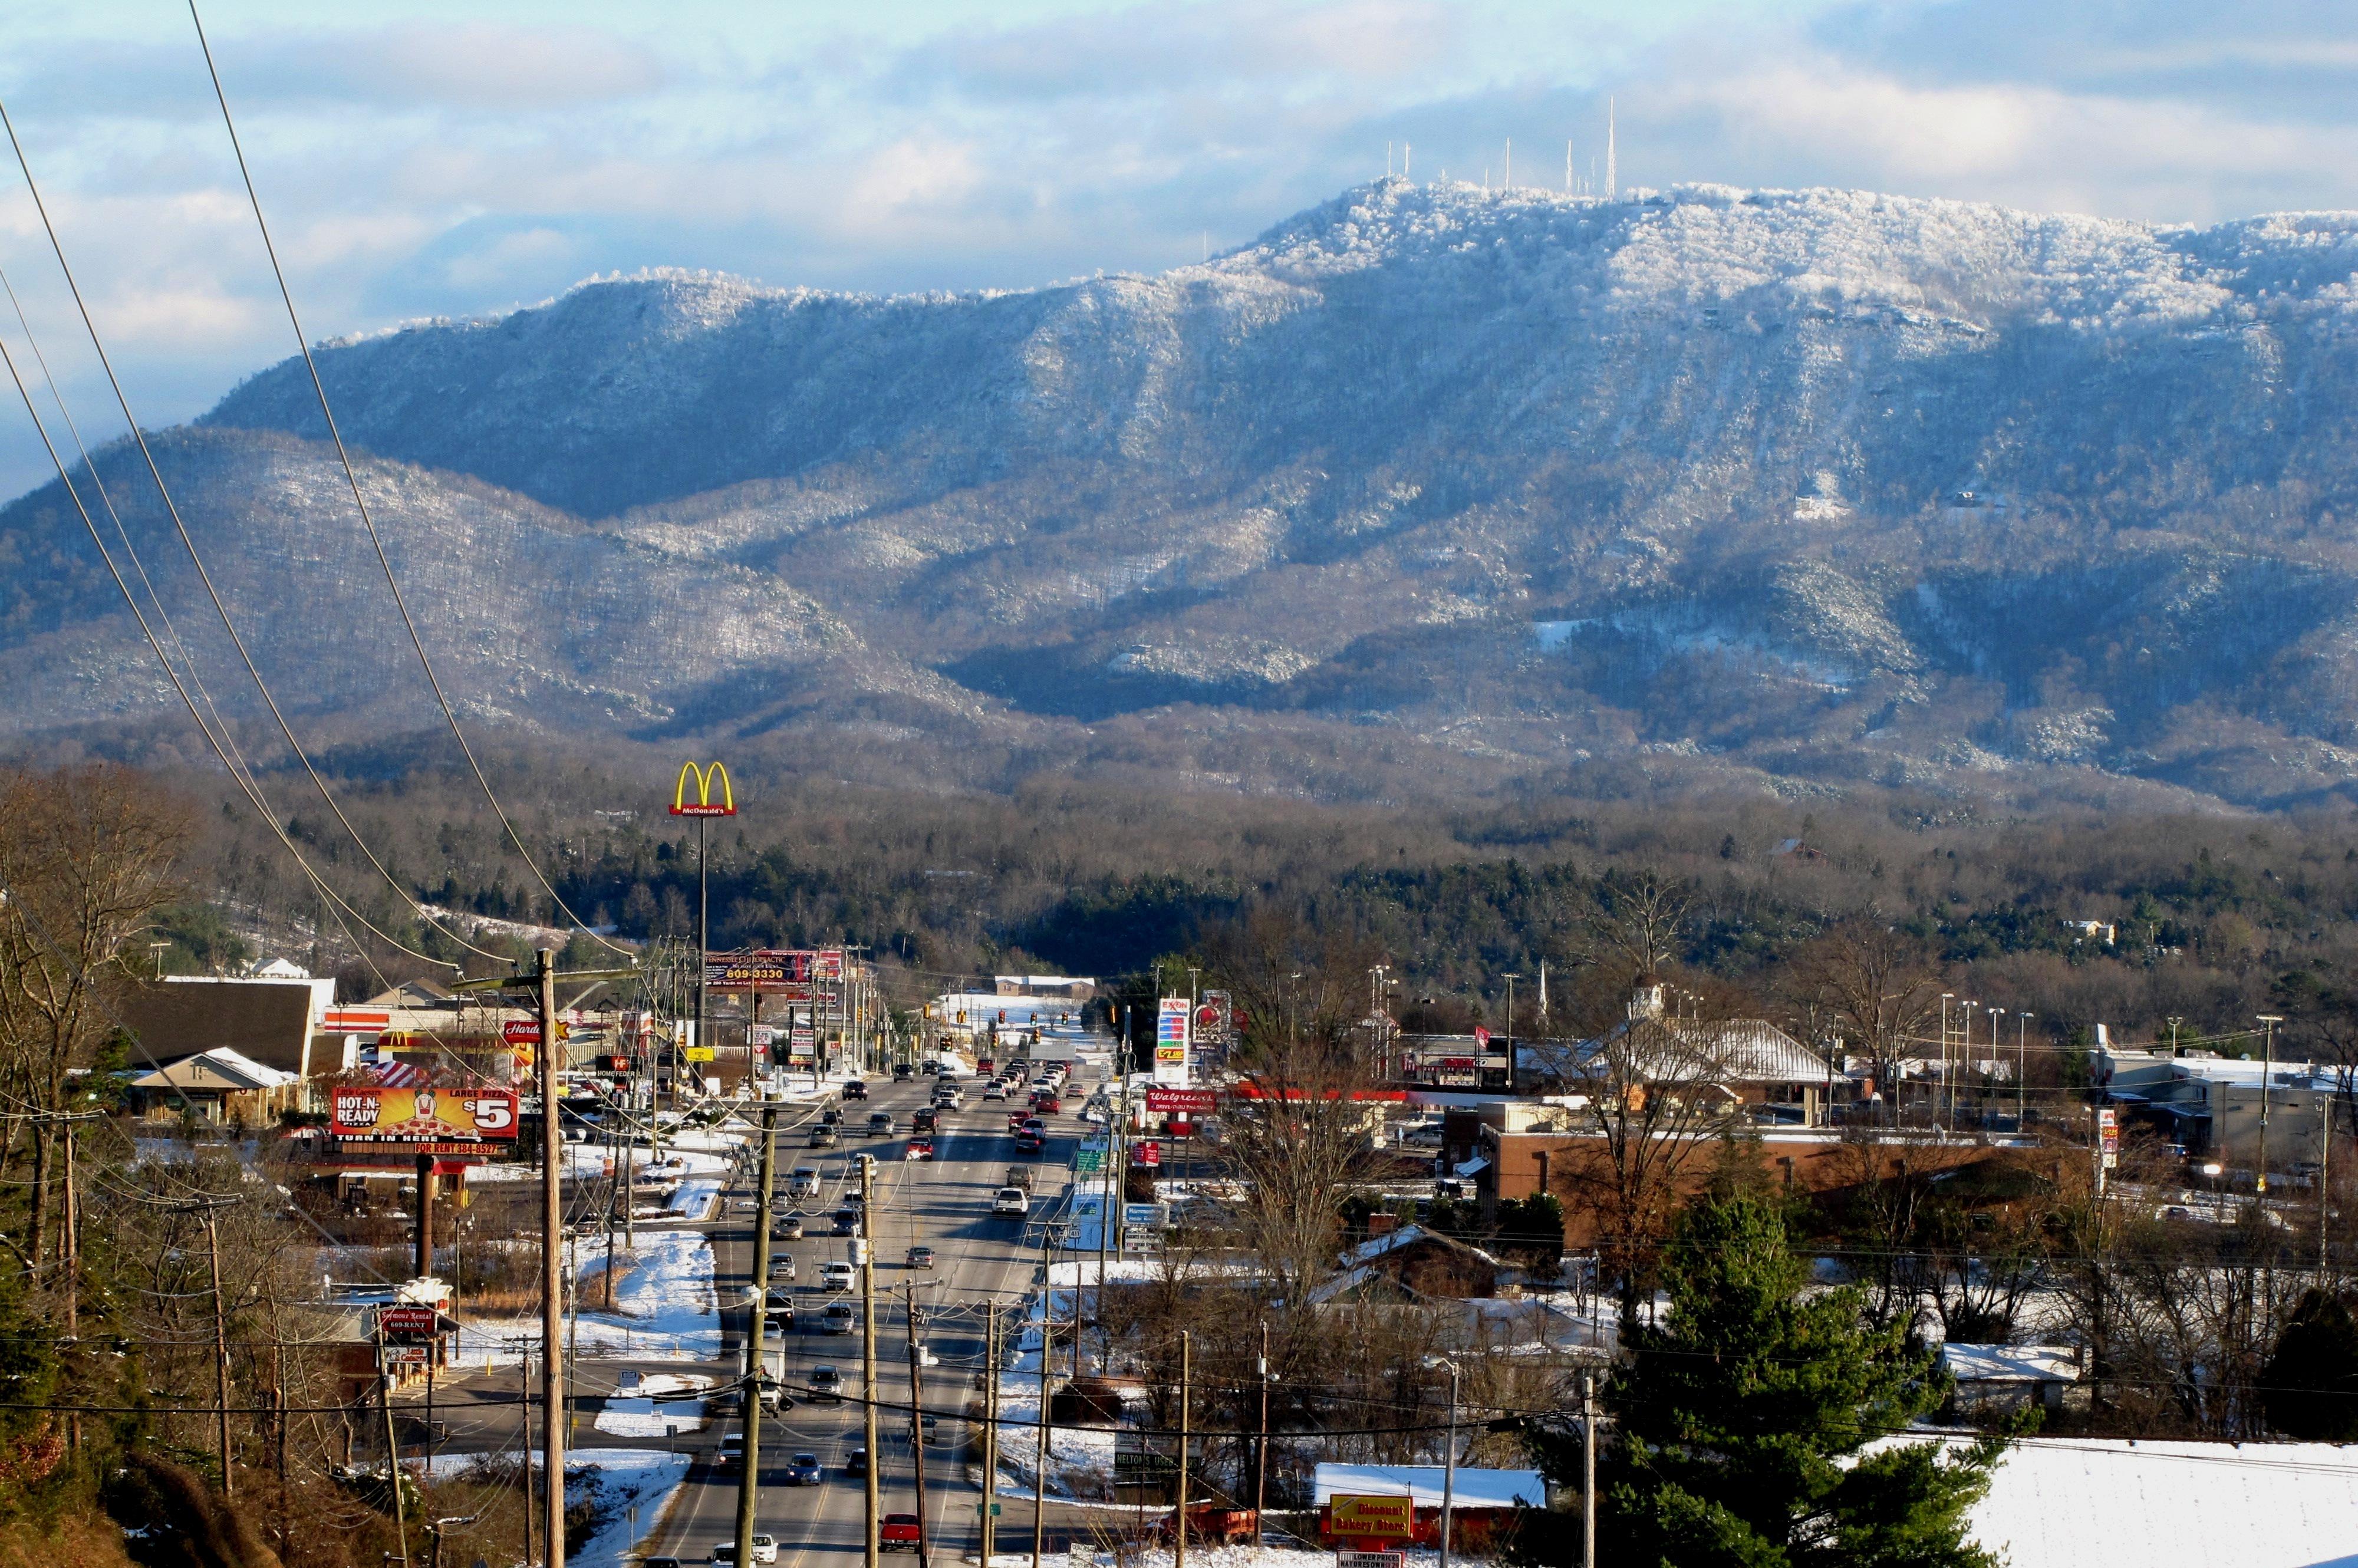 Gatlinburg In The Fall Wallpaper Tennessee Familypedia Fandom Powered By Wikia